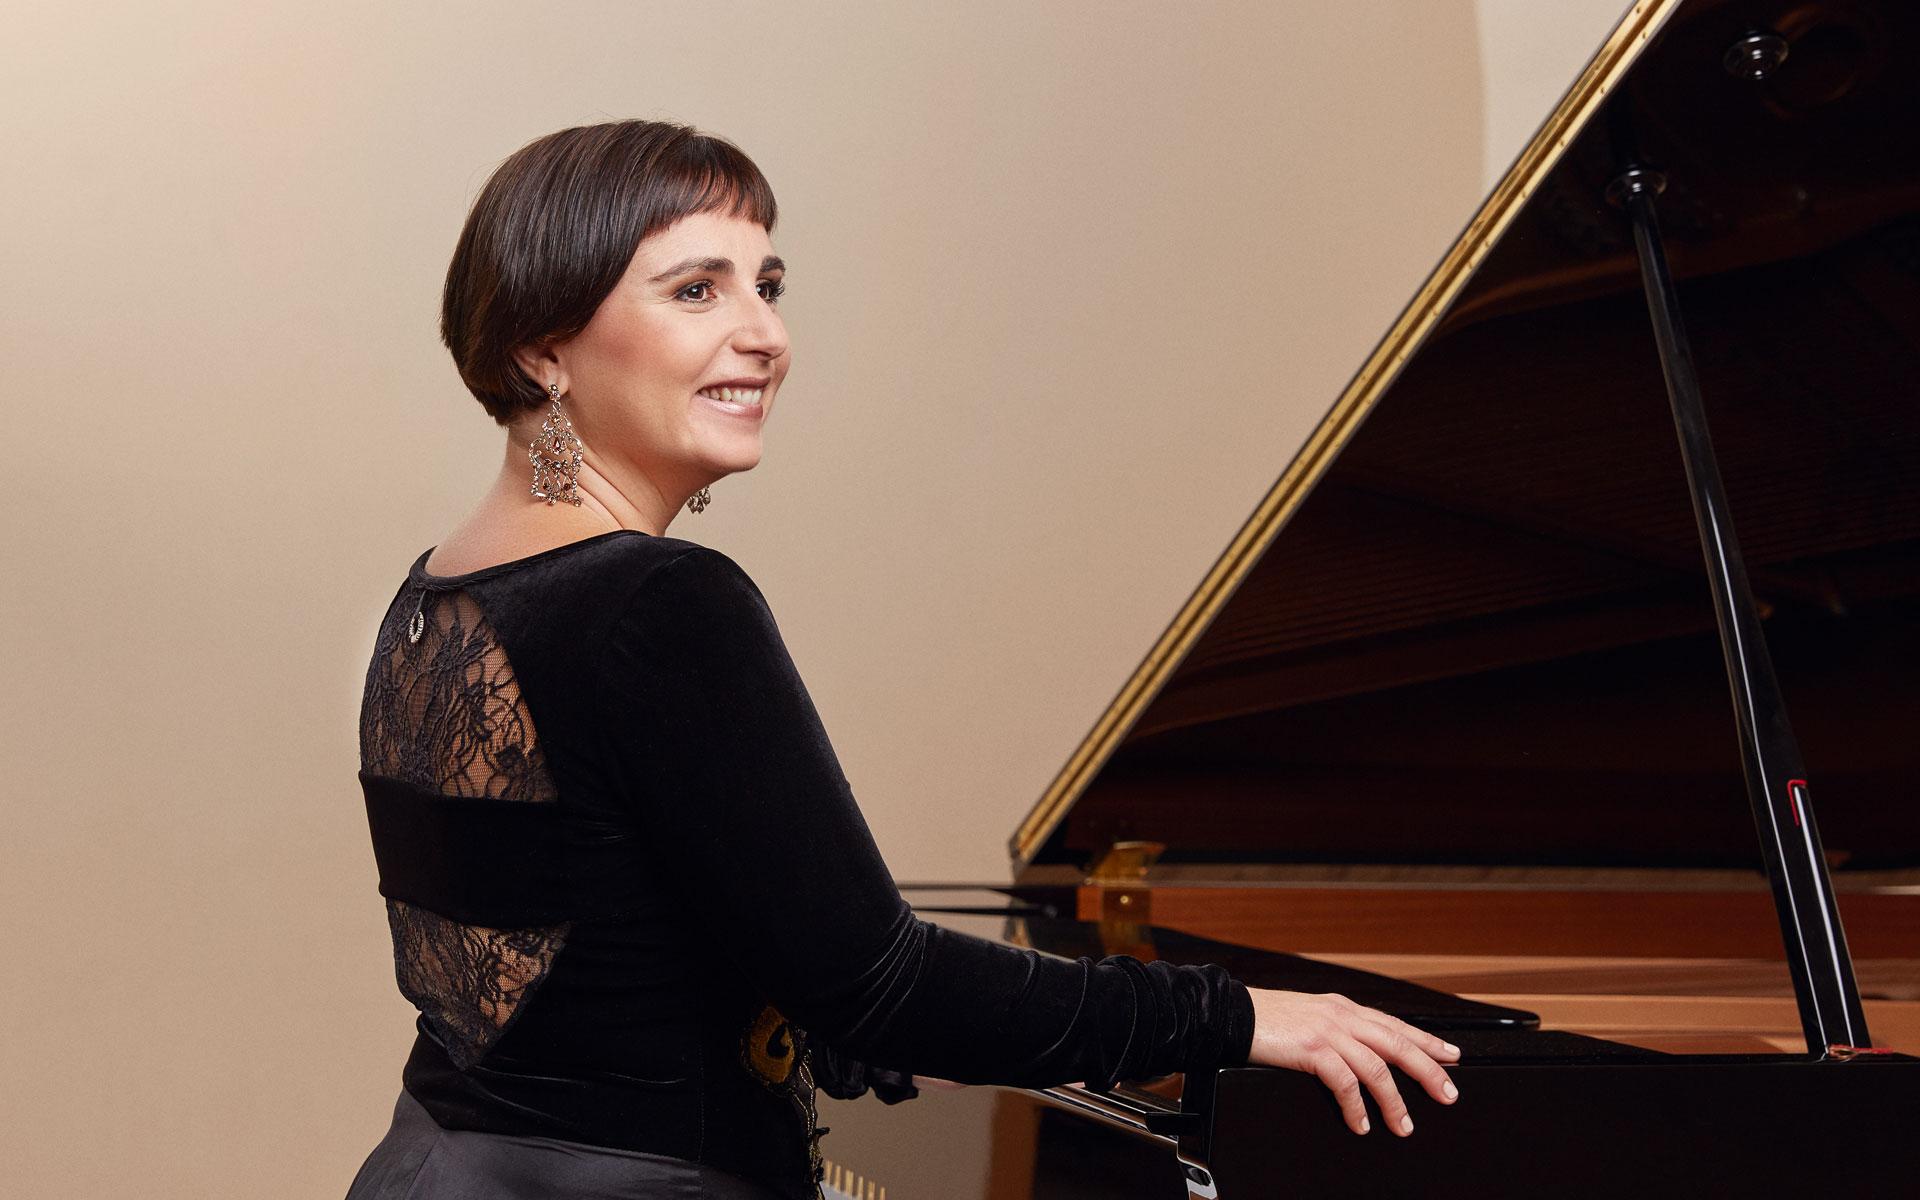 Frau Pavlovic spielt Klavier